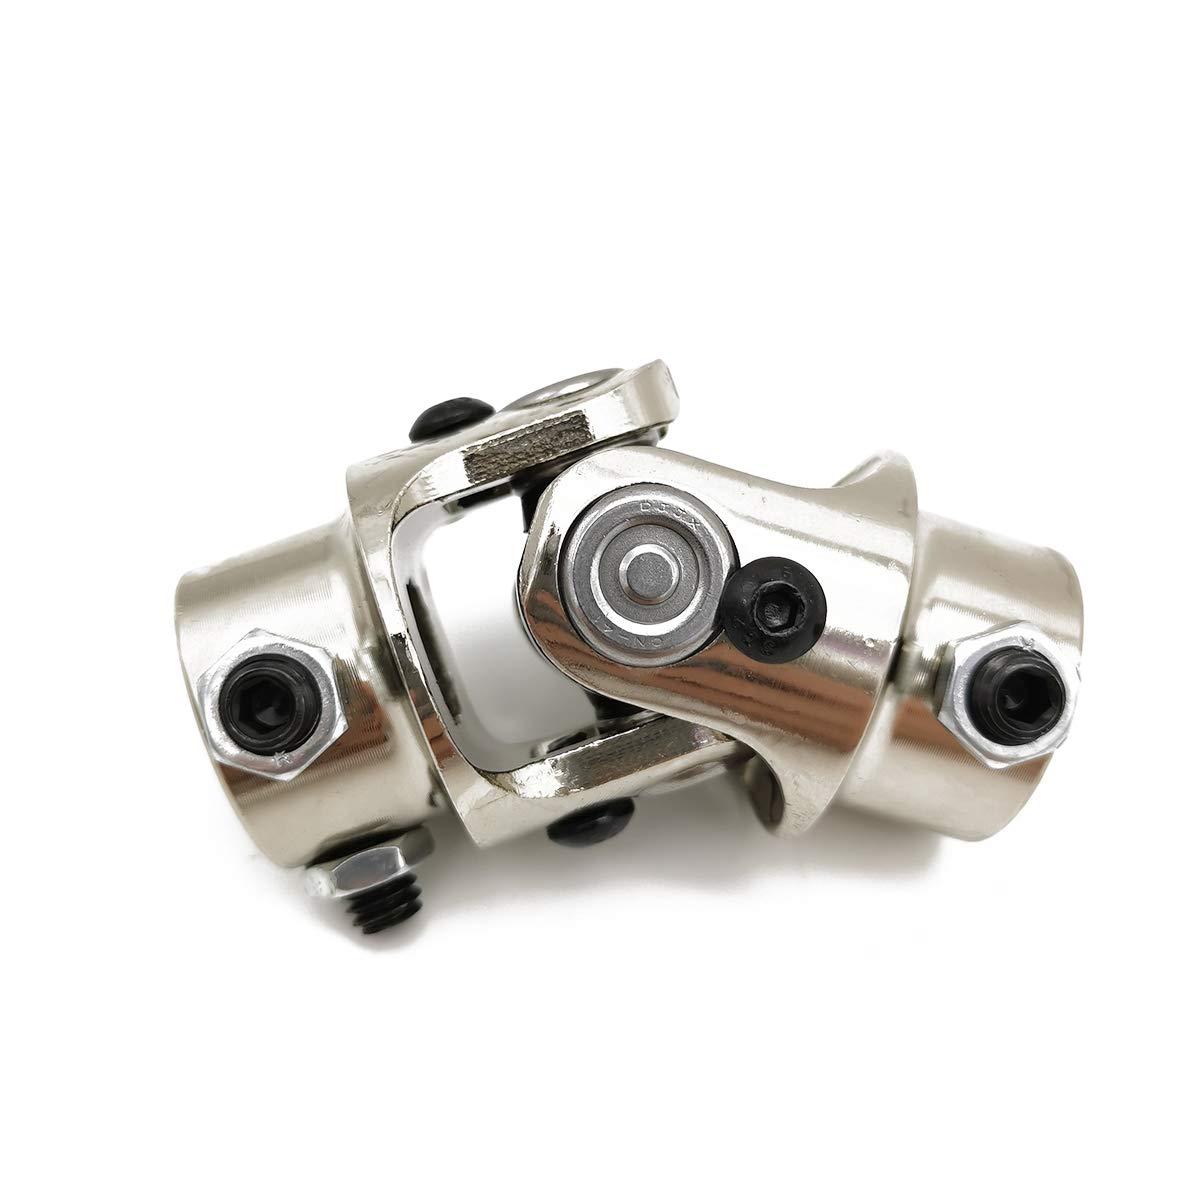 Ensun 3/4-30 Spline x 3/4 DD Nickel Plating Single Steering Shaft Universal U Joint, Maximum Working Angle: 35° Degree, Total Length: 83mm (3-1/4'')